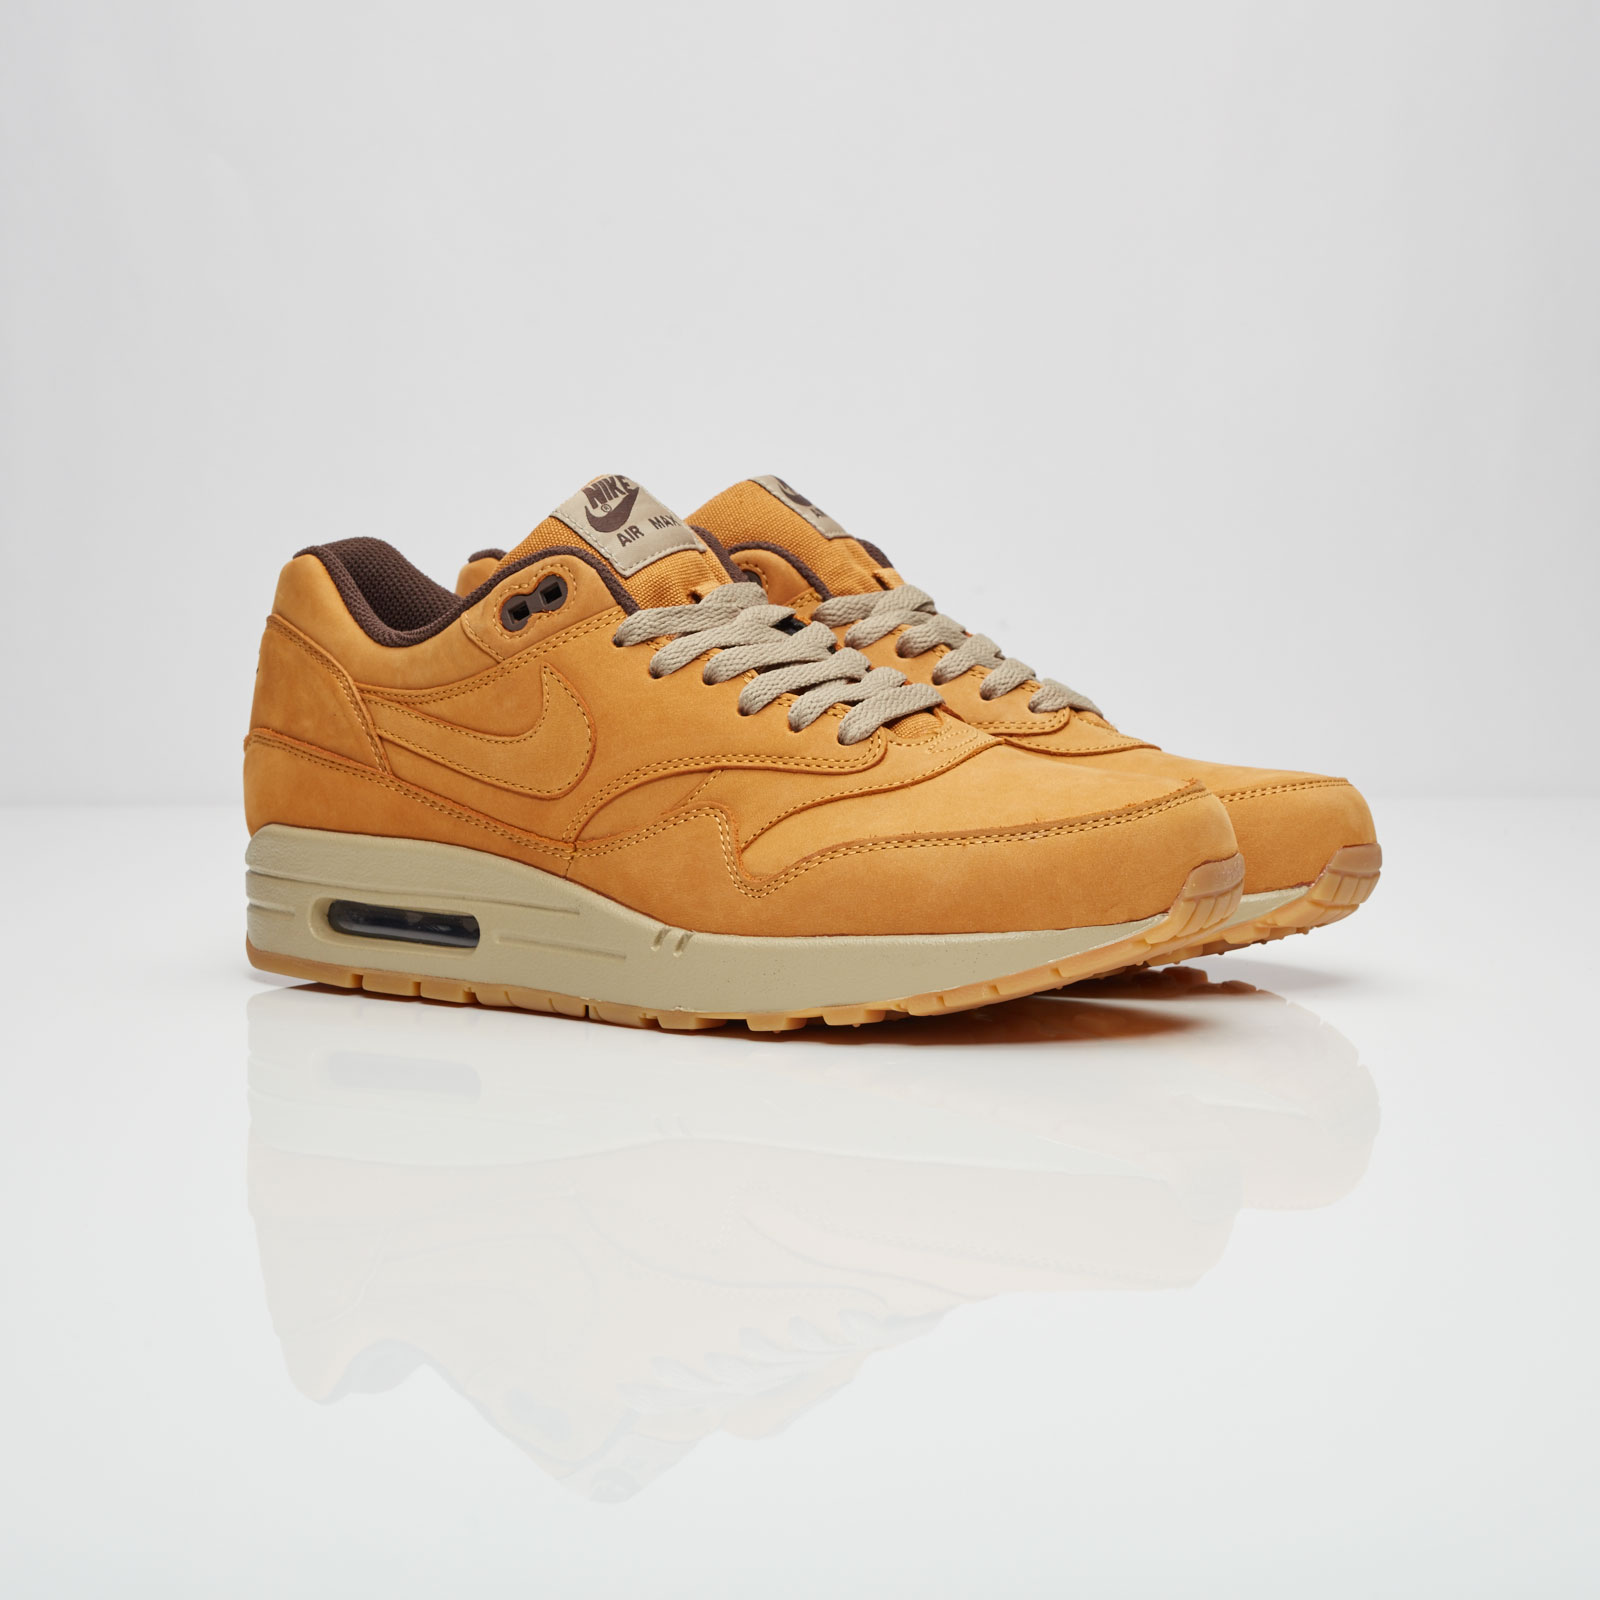 62cf37e2c32dbf Nike Air Max 1 Leather Premium - 705282-700 - Sneakersnstuff ...